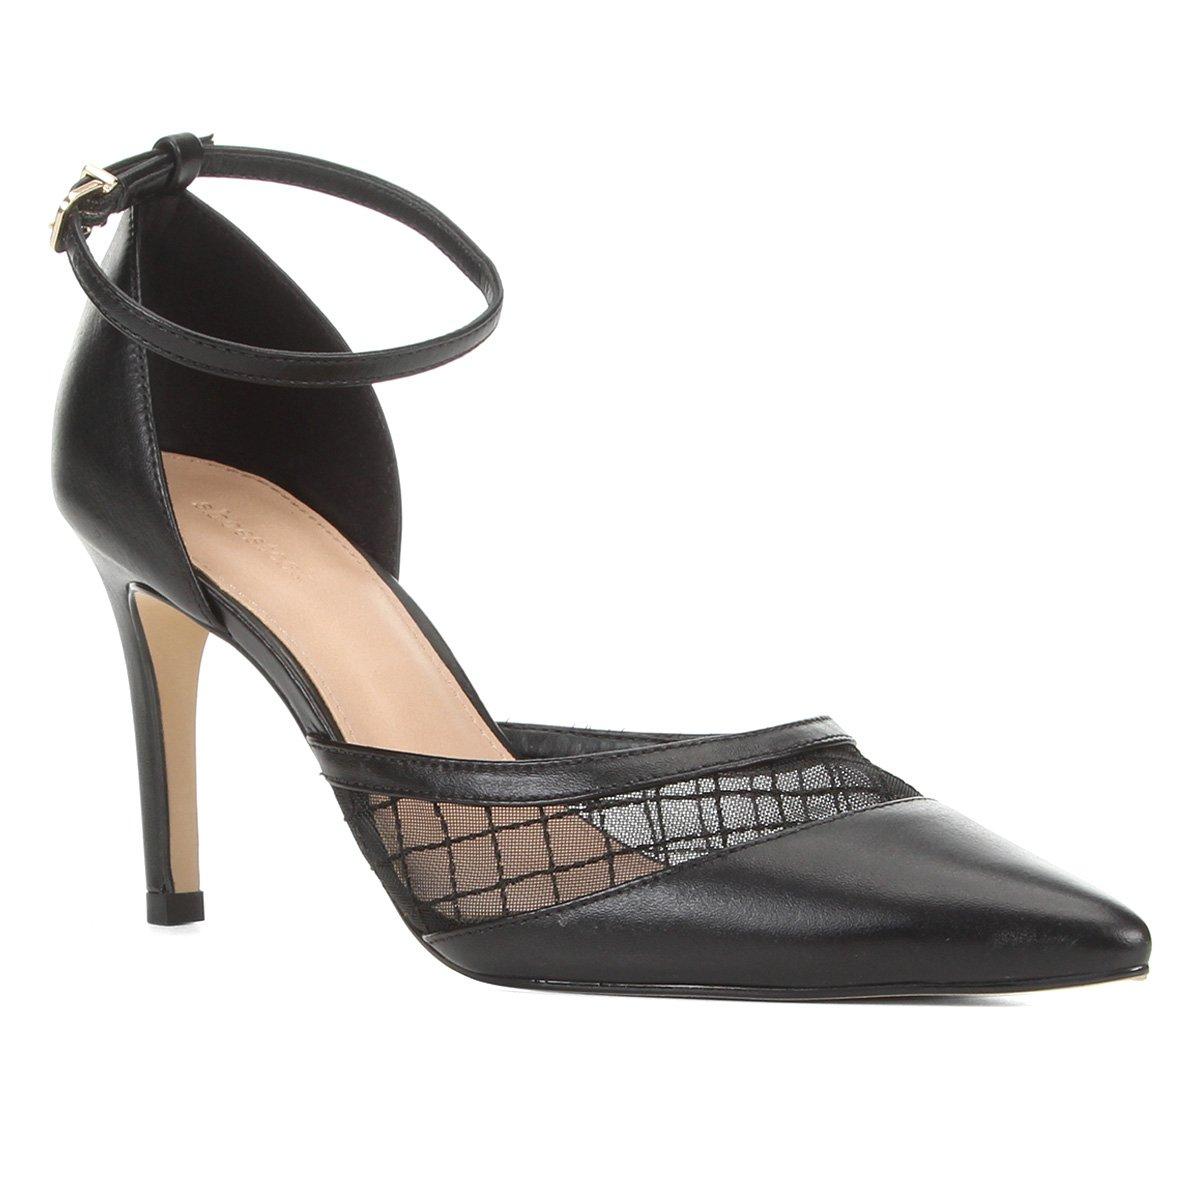 Scarpin Couro Shoestock Tela Bordada Feminina - Preto